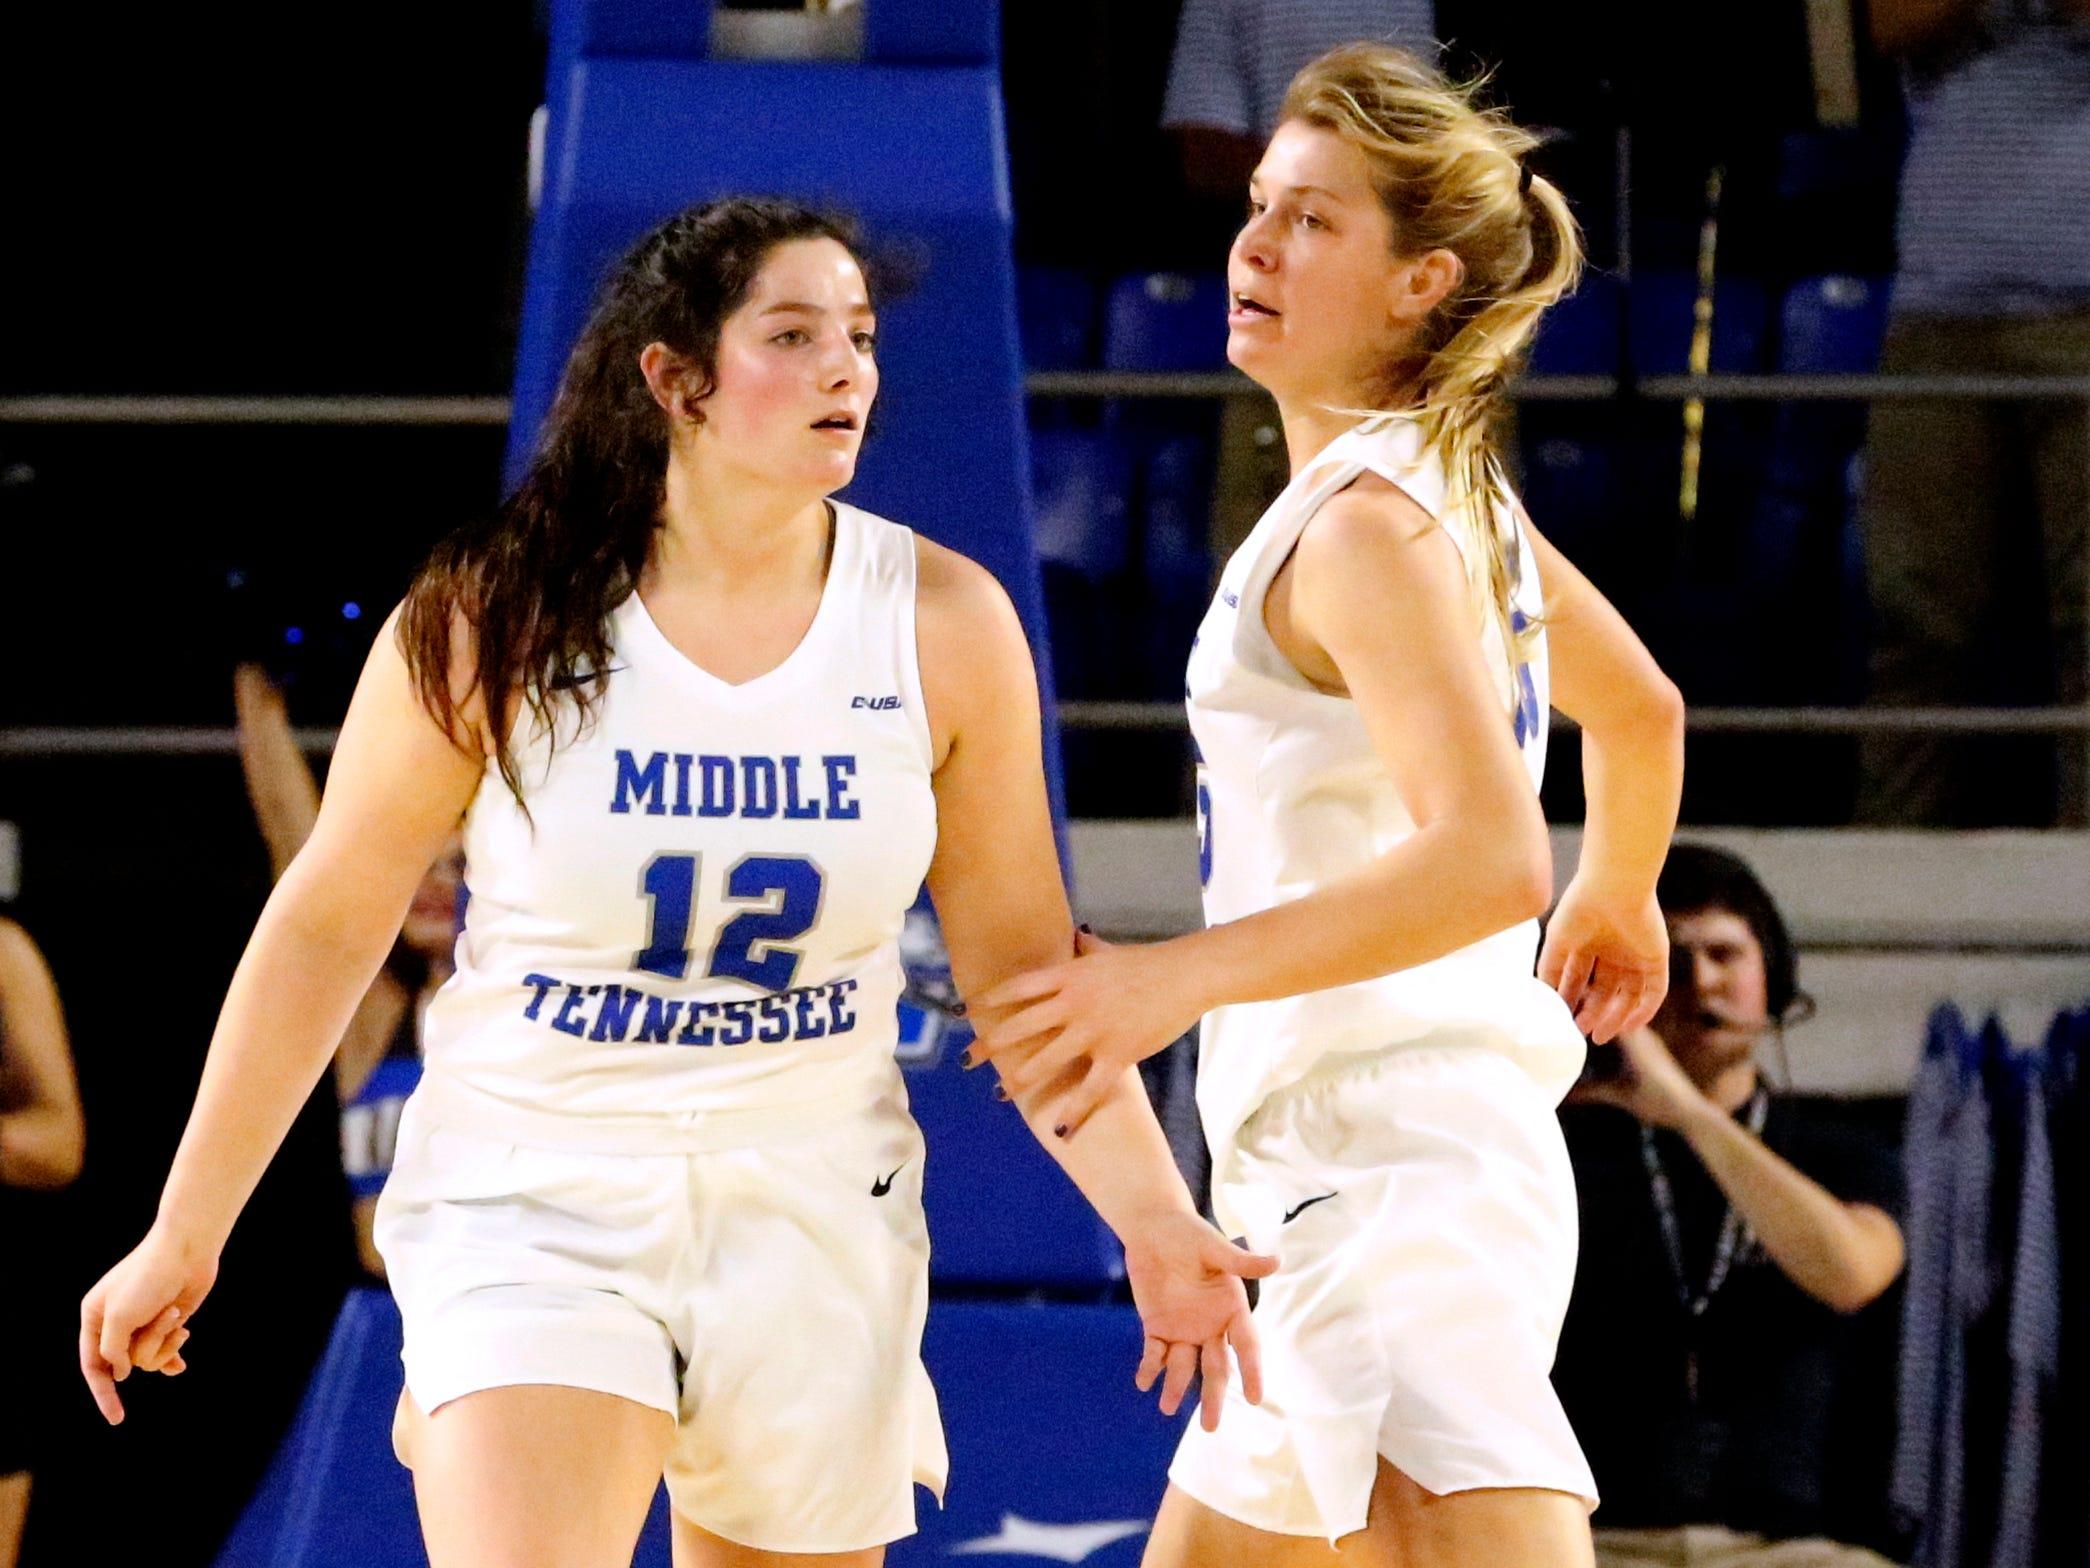 MTSU's guard Anna Jones (15) congratulates MTSU's guard Jess Louro (12) for shooting a three point basket on Thursday Jan. 10, 2019, against Southern Miss.